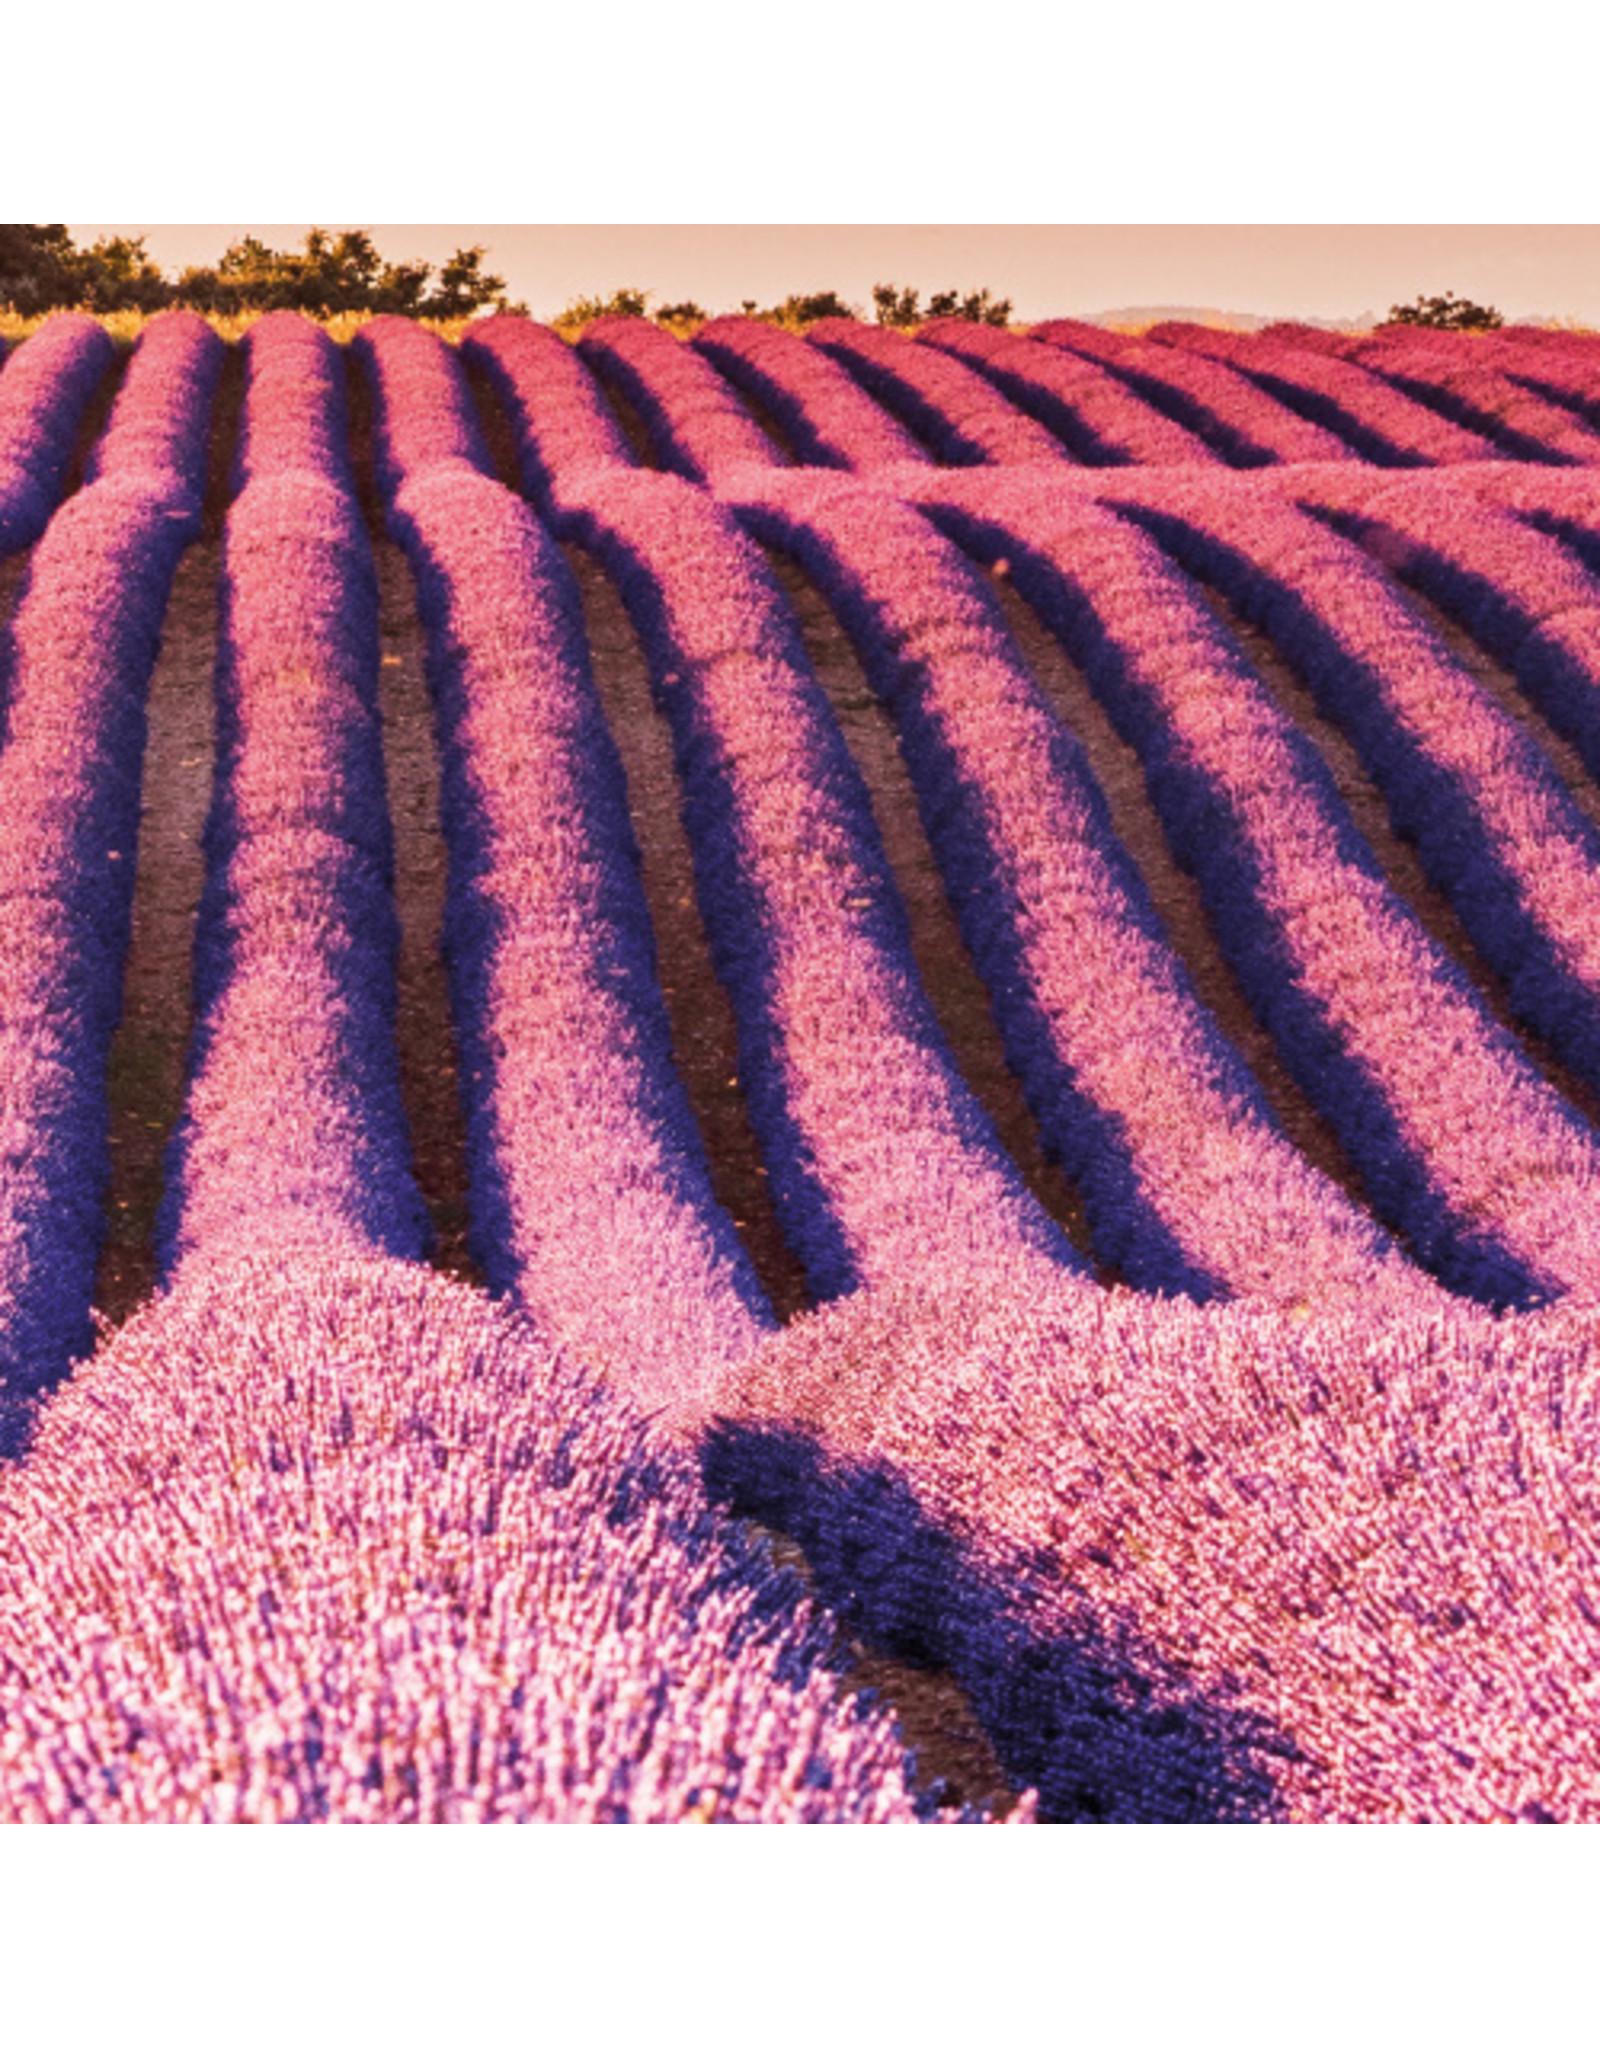 Dunnebier Home Muursticker Lavendel veld - verwijderbaar